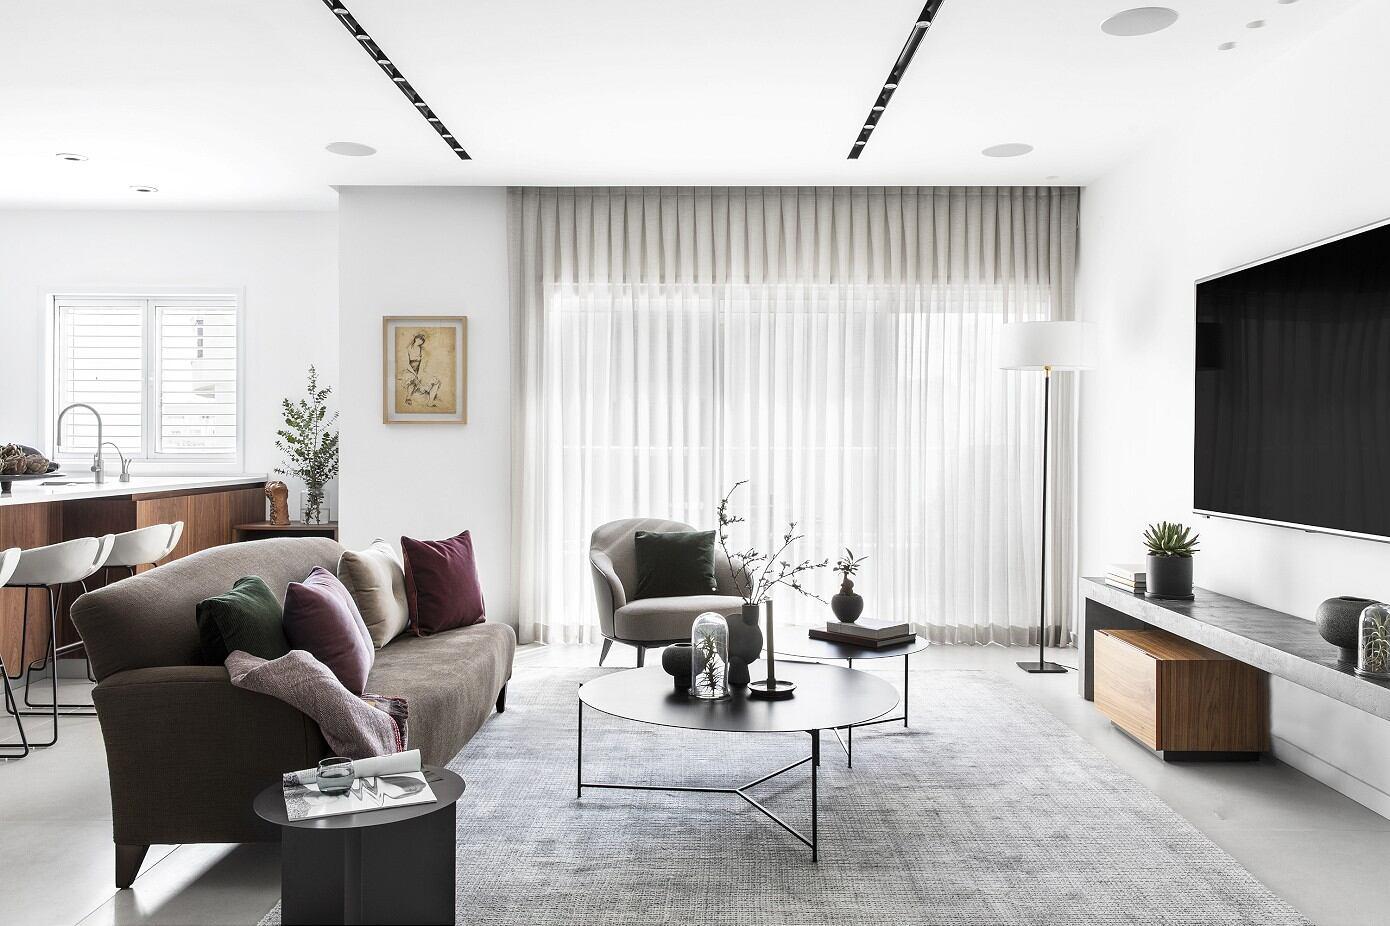 H Apartment by Maya Sheinberger Interior Design